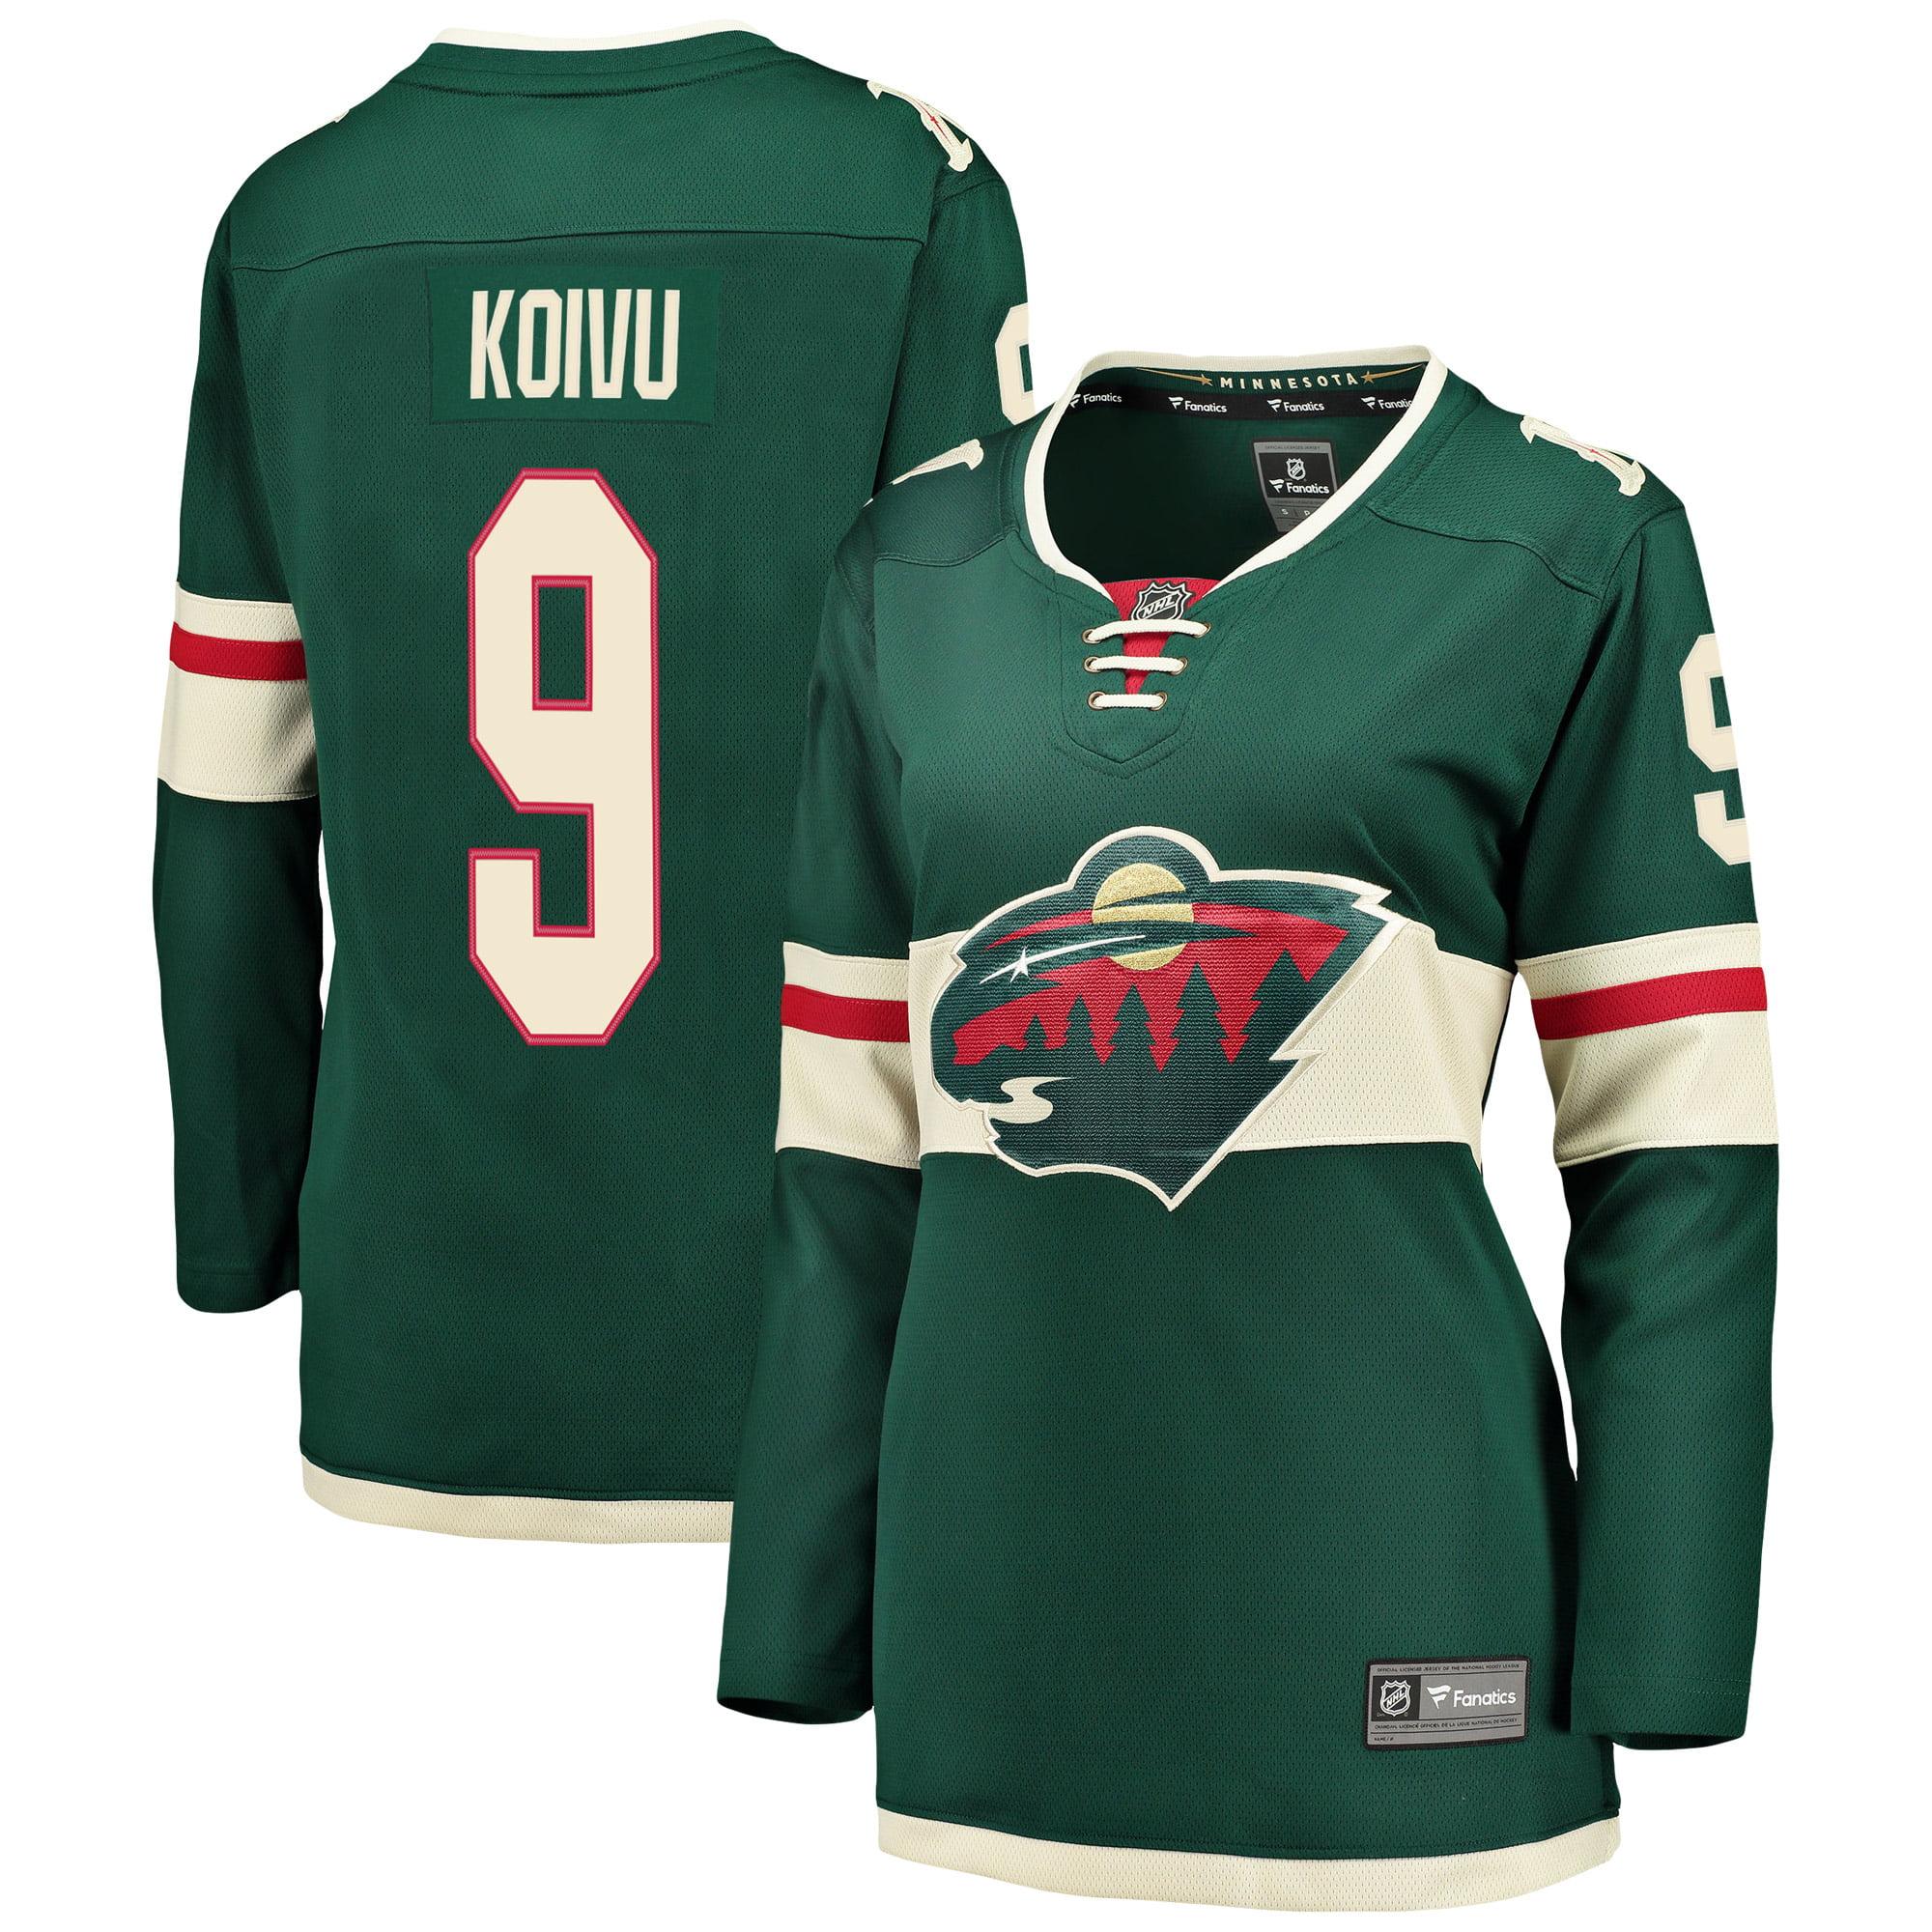 Mikko Koivu Minnesota Wild Fanatics Branded Women's Breakaway Player Jersey - Green